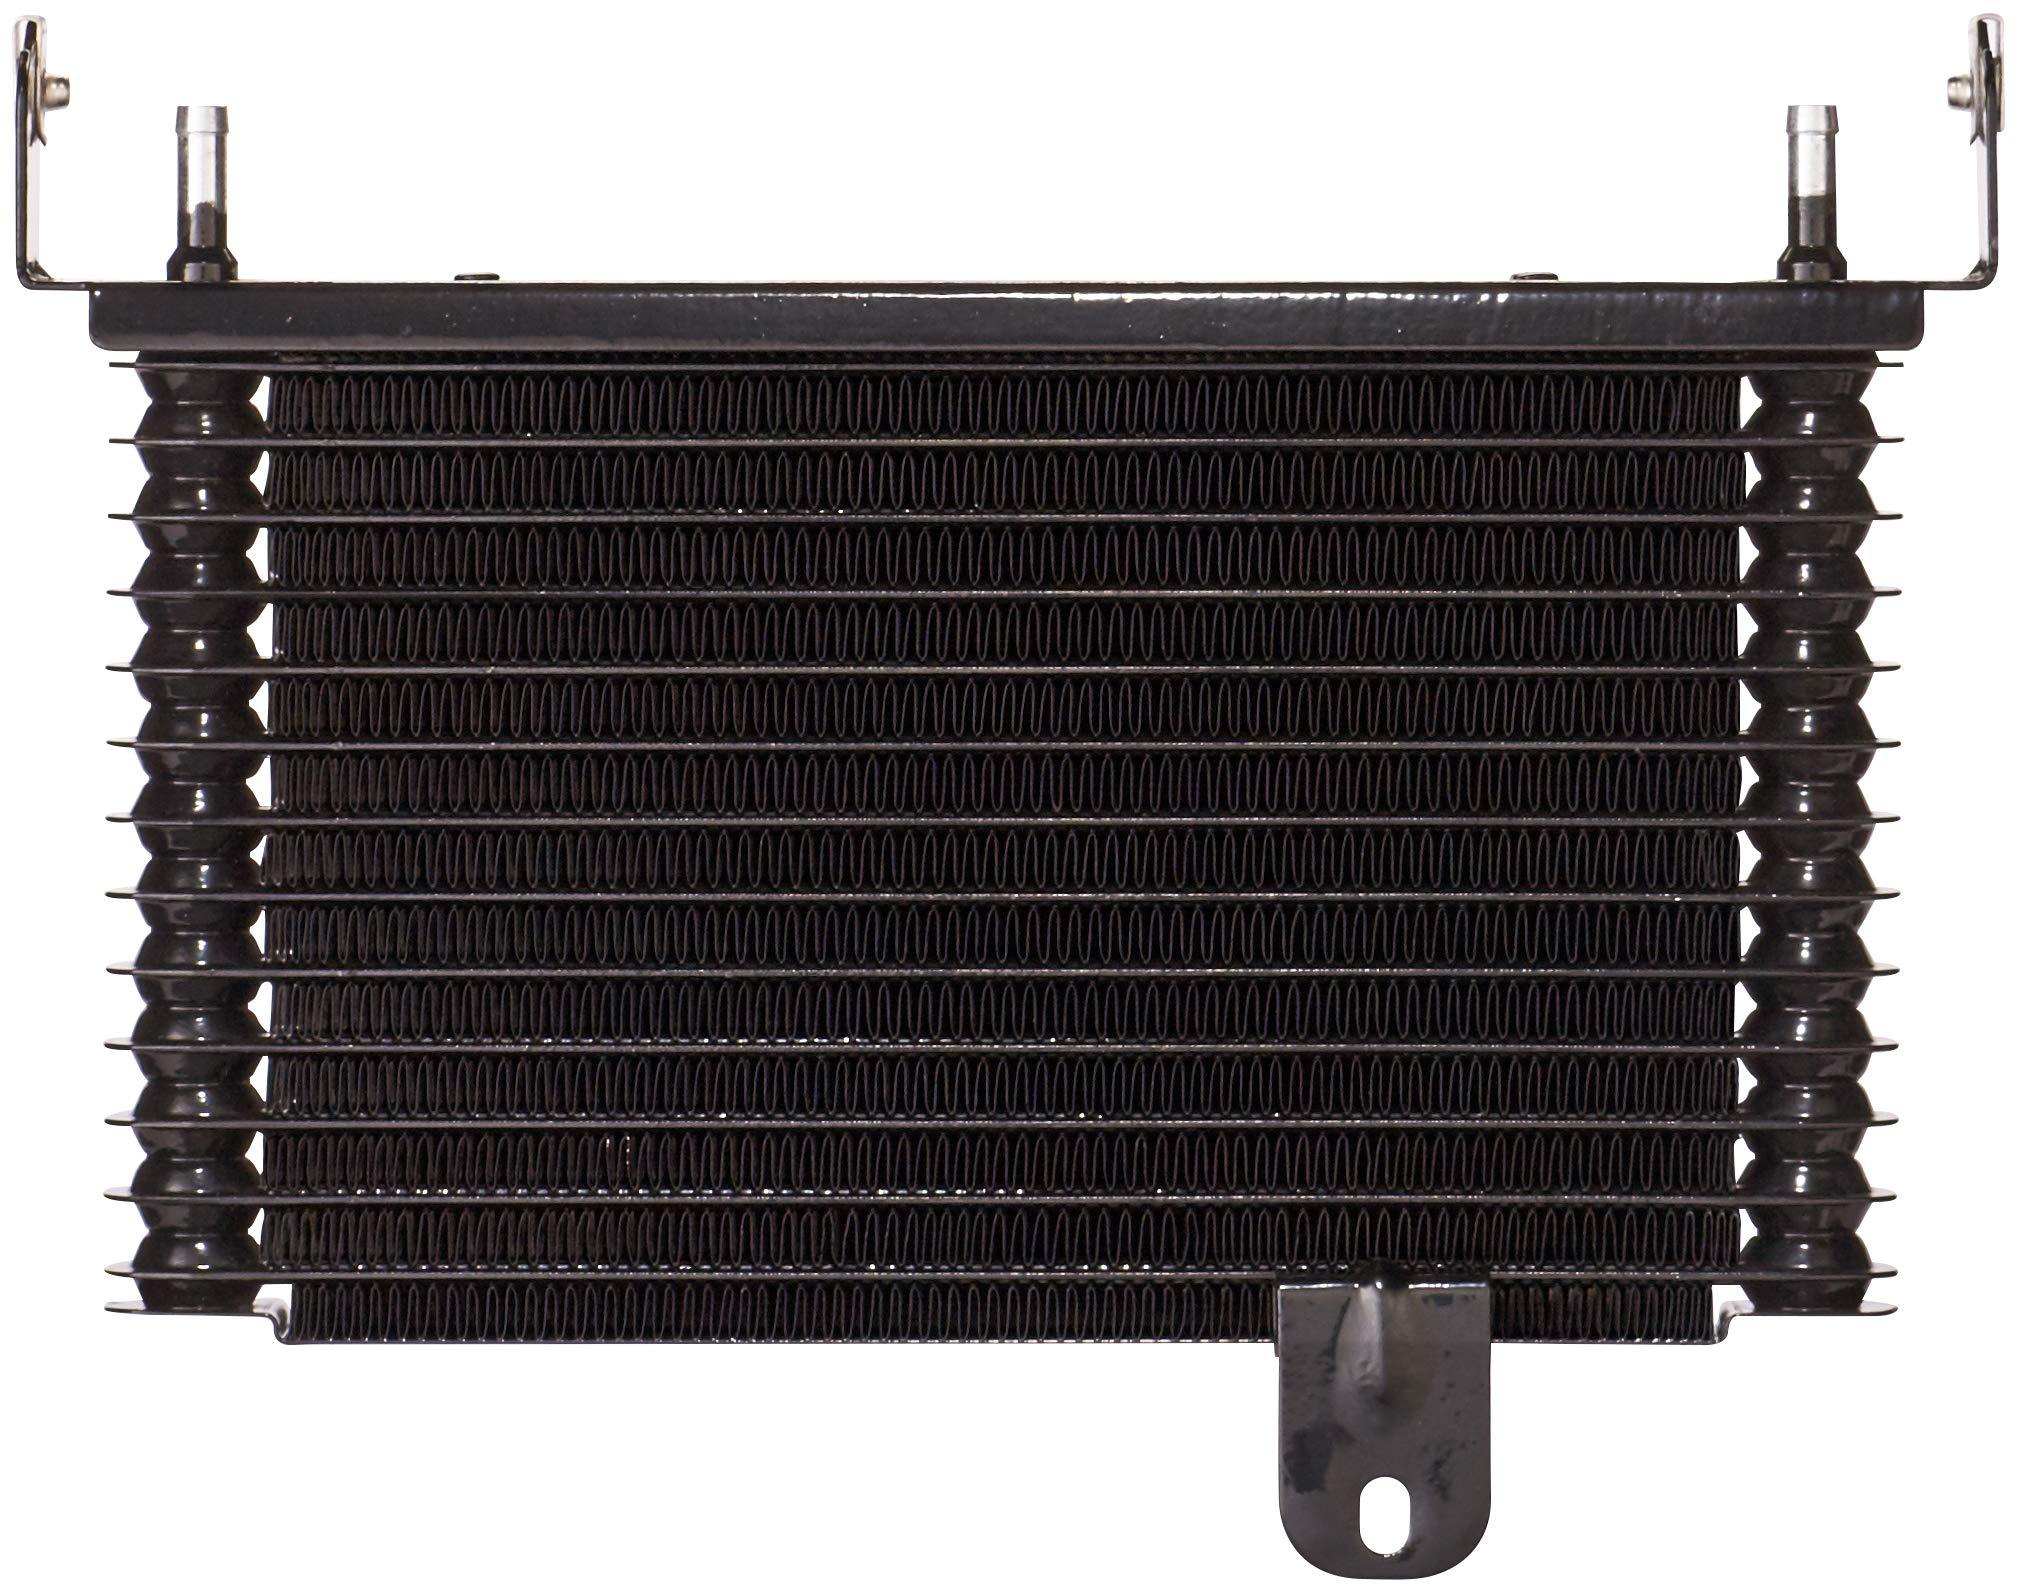 Spectra Premium FC1531T Transmission Oil Cooler